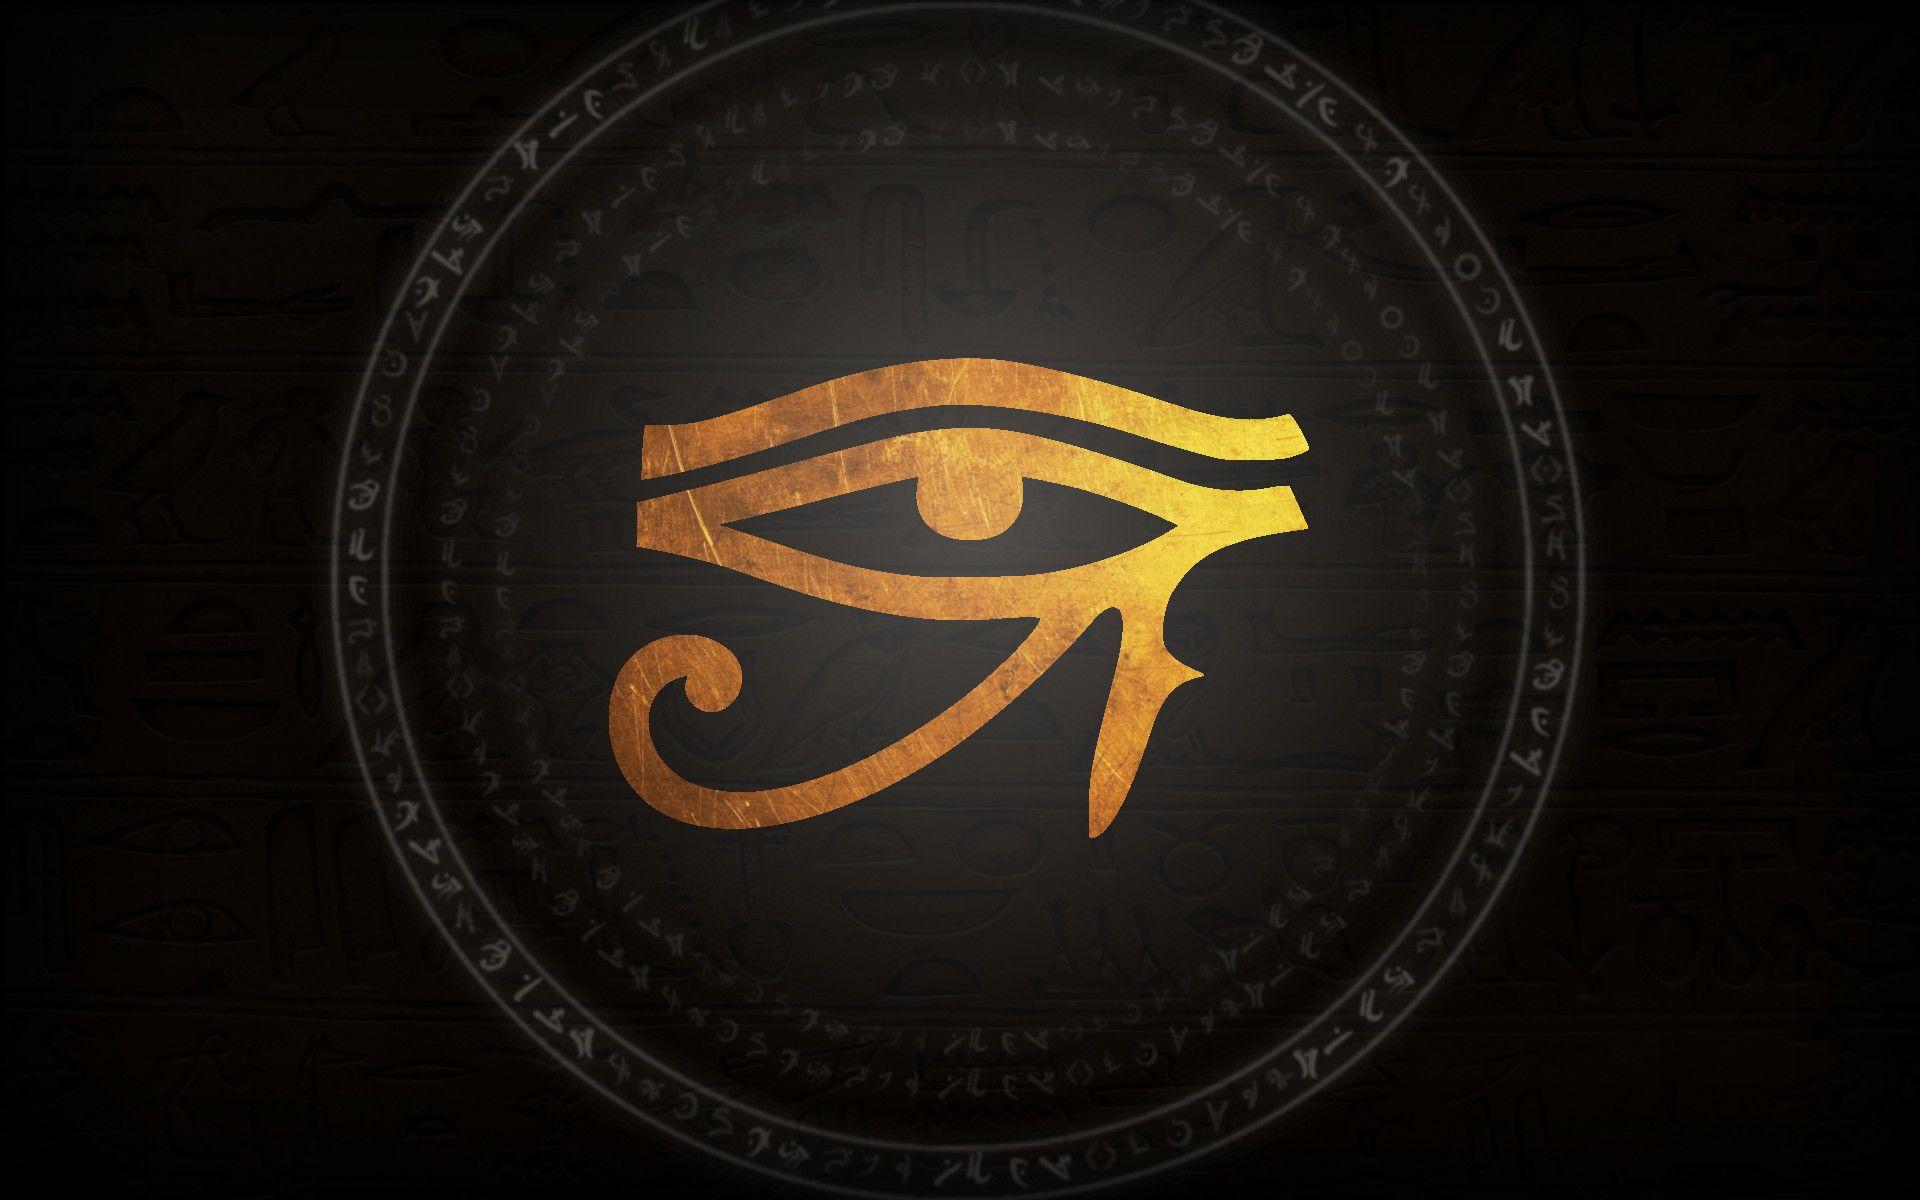 1920x1200 Full Full Hd Eye Of Horus Wallpapers D Screens Wallpapers Ancient Egyptian Deities Horus Wallpaper Eye Of Ra